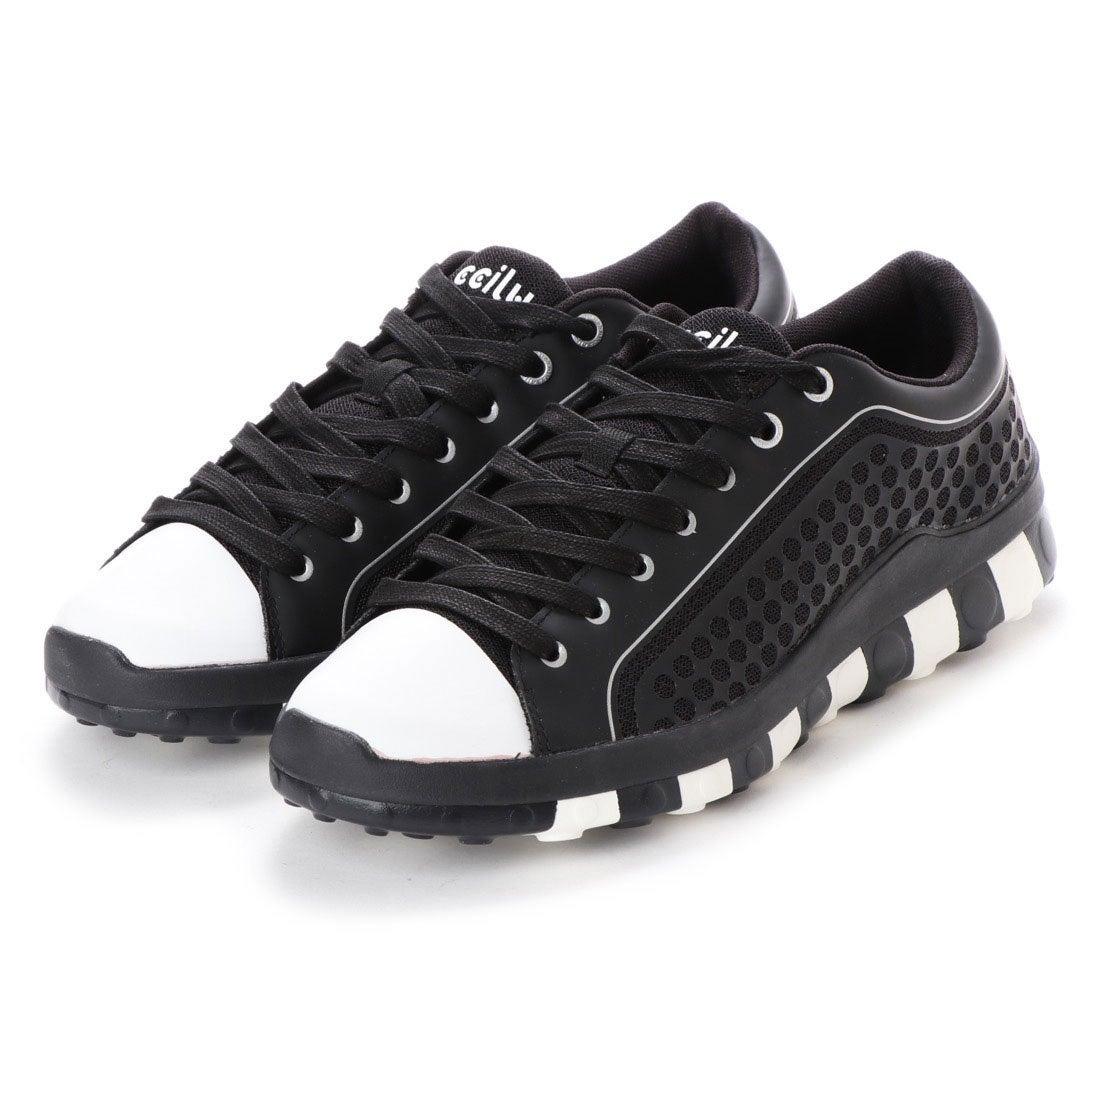 2a8e9f564630c6 チル ccilu Horizon スニーカー (ブラック) -靴&ファッション通販 ロコンド〜自宅で試着、気軽に返品